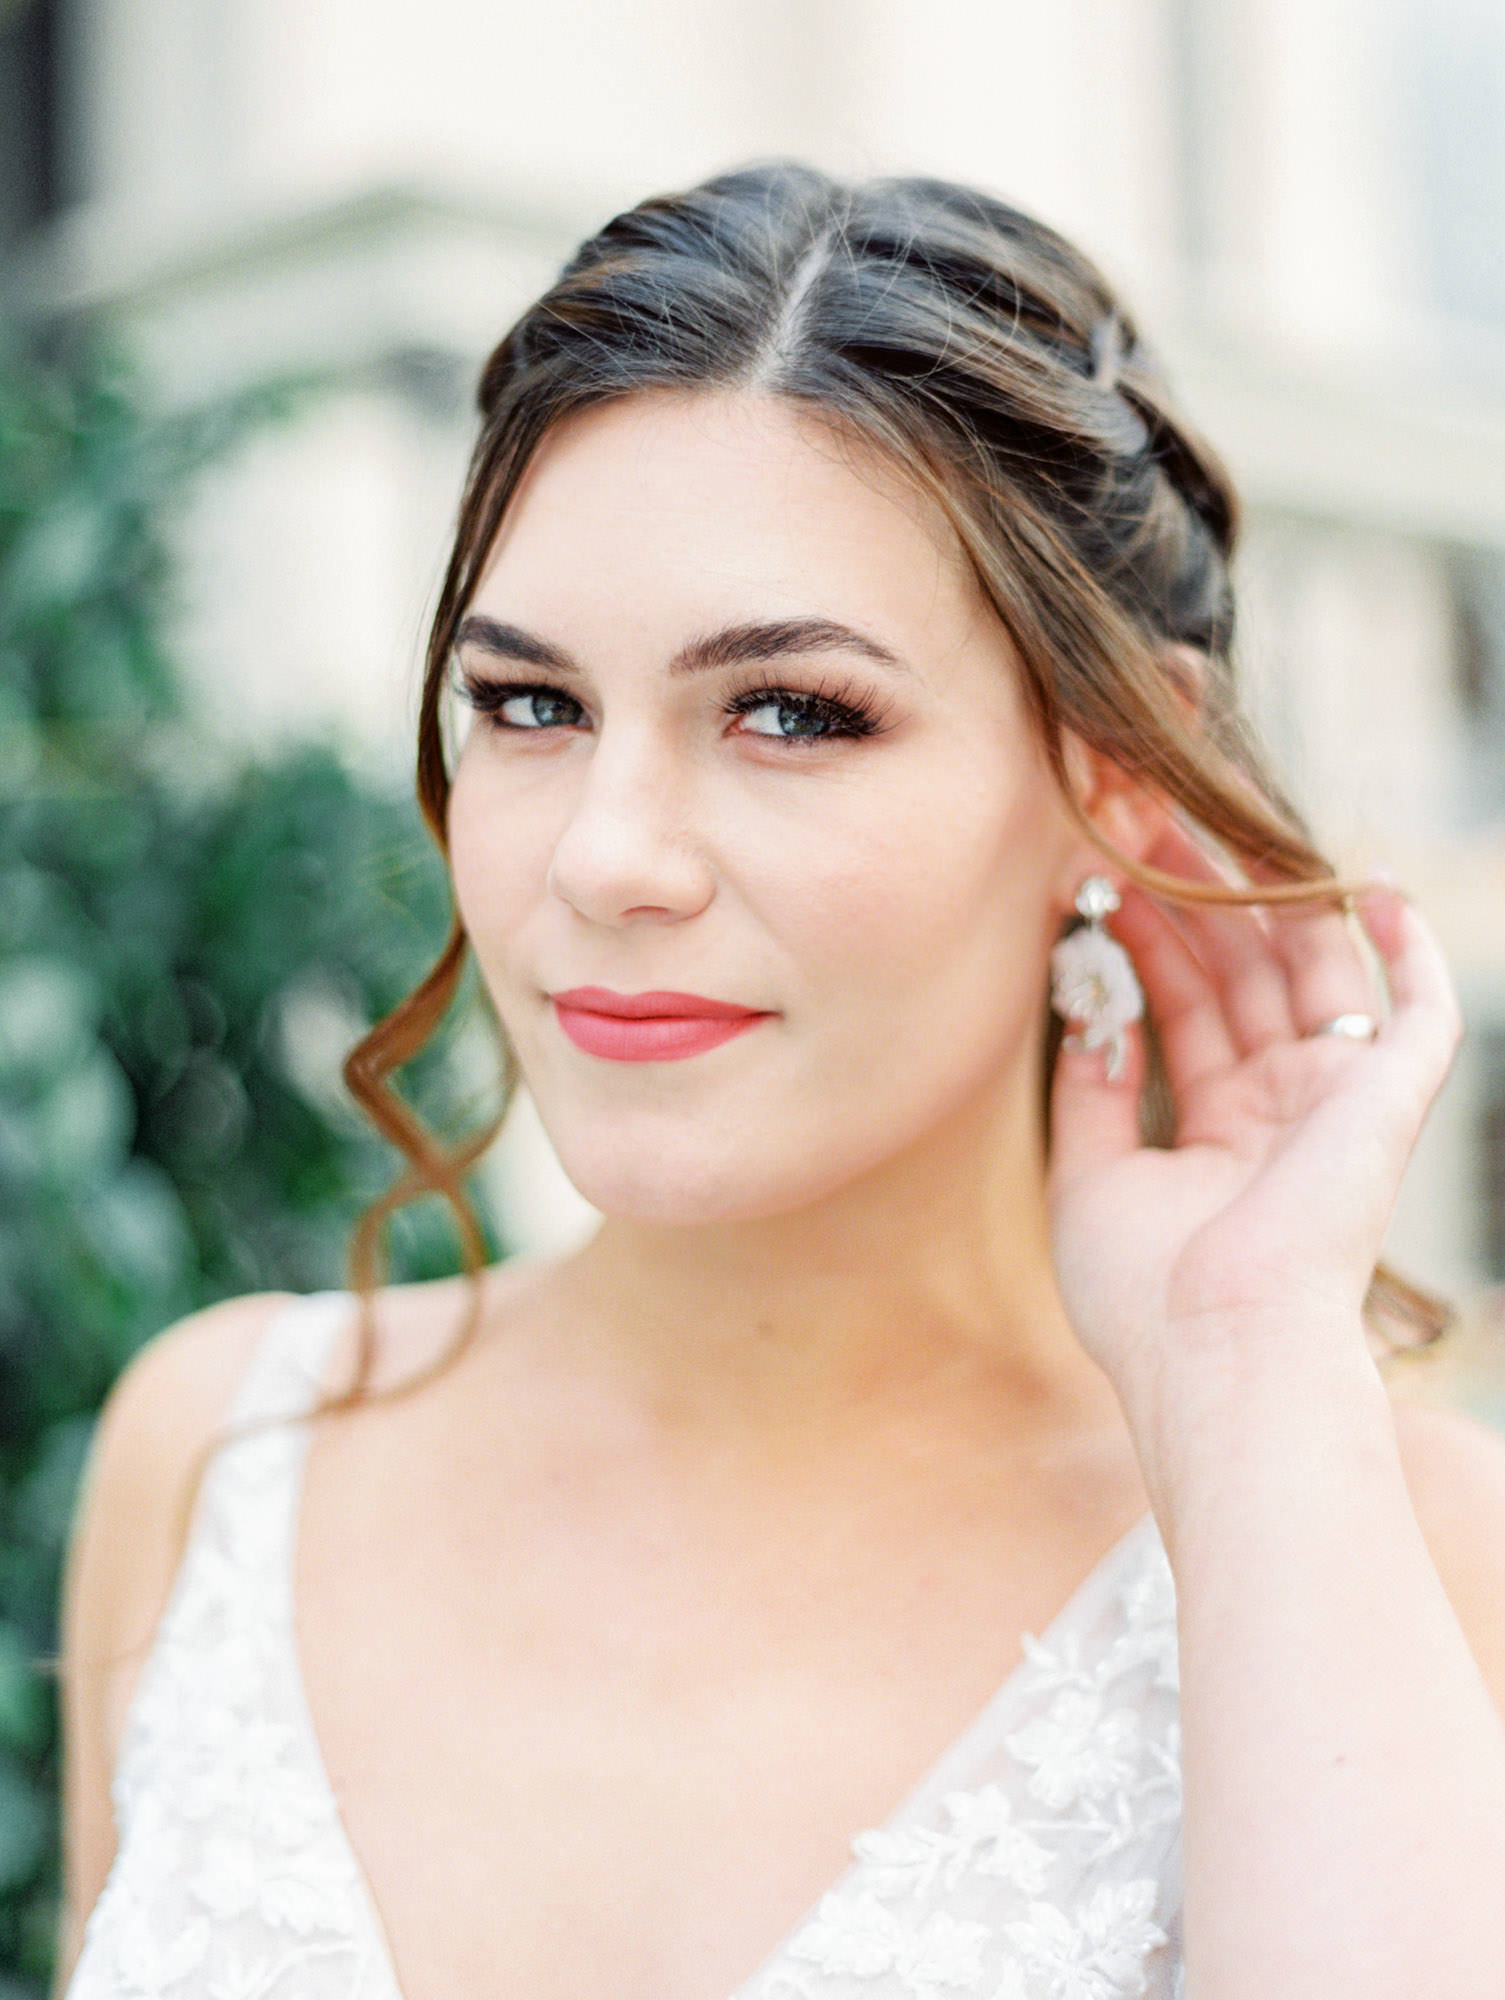 1137 sleeveless ballgown with floral lace Martina Liana wedding dress in San Diego by Cavin Elizabeth - San Diego film photographer